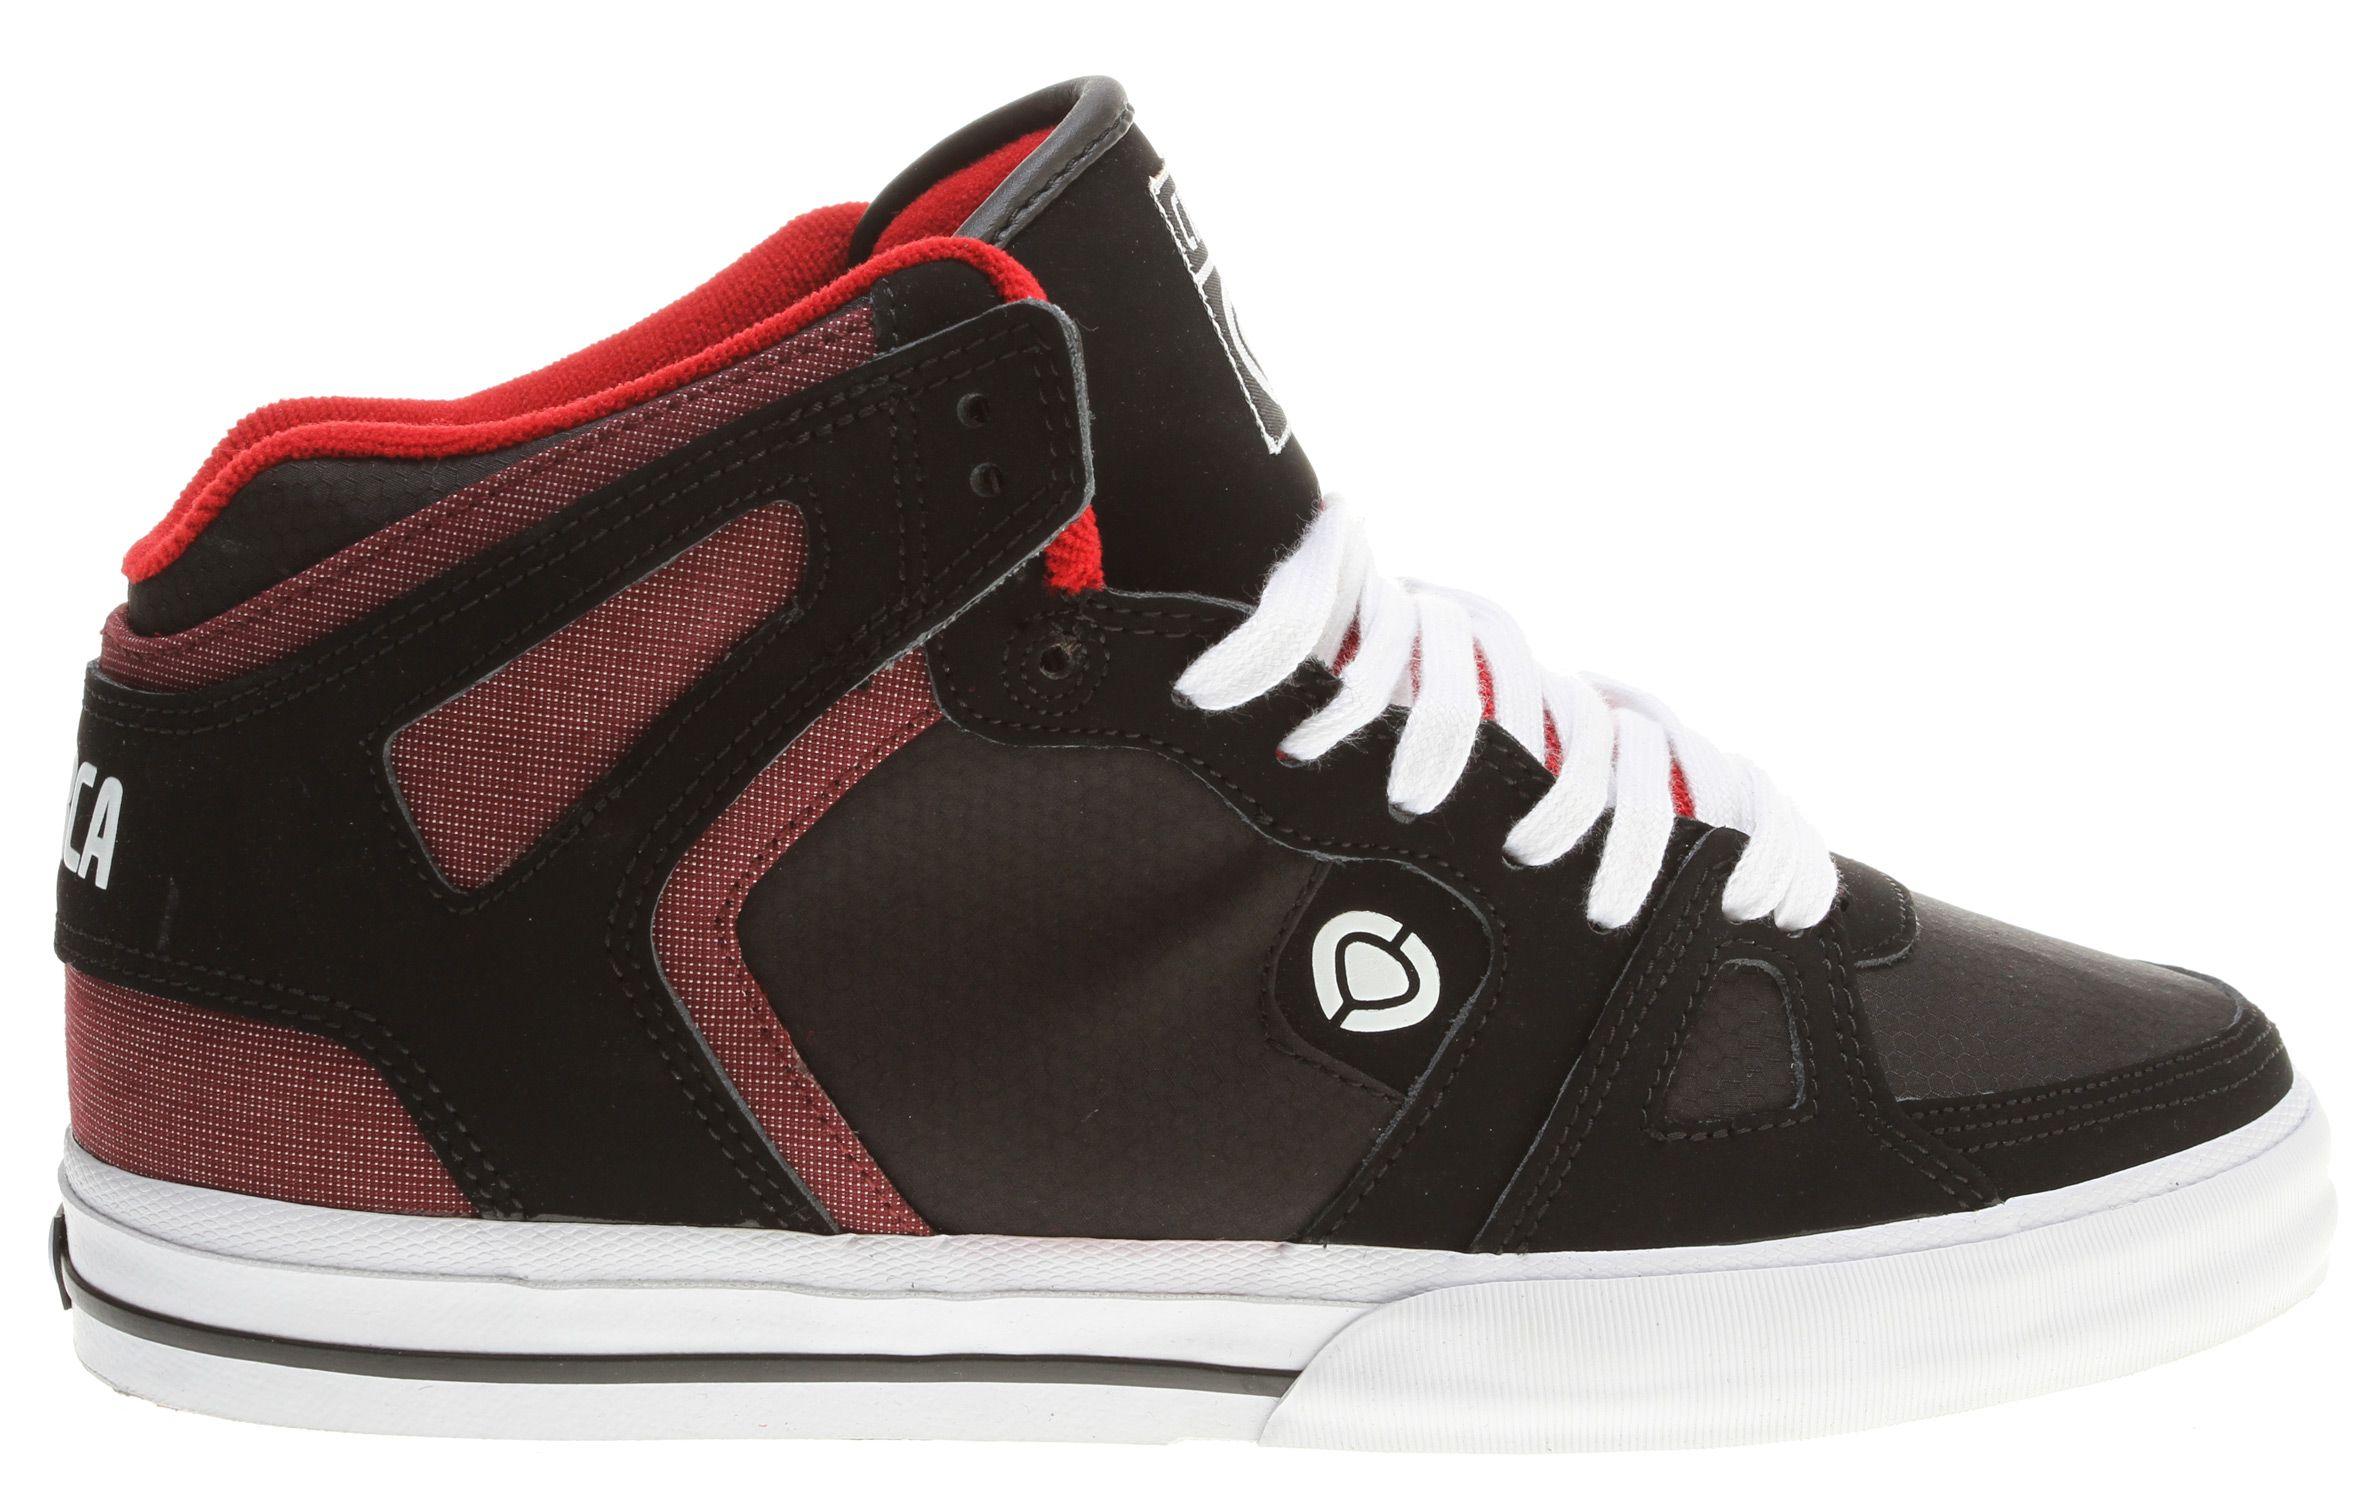 Circa 99 Vulc Skate Shoes | Skate shoes